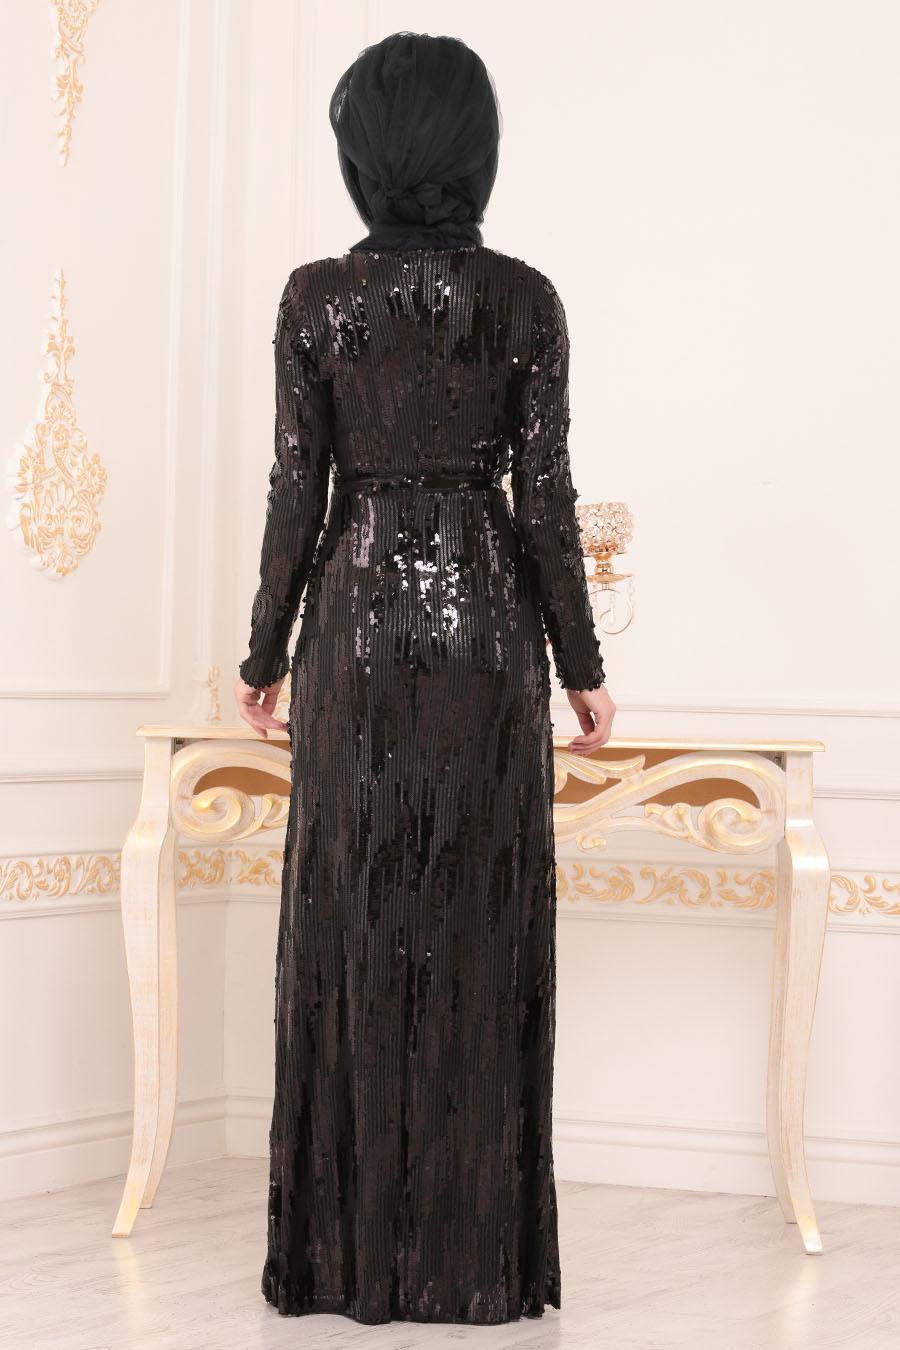 Nayla Collection - Pul Payetli Siyah Tesettür Abiye Elbise 9110S